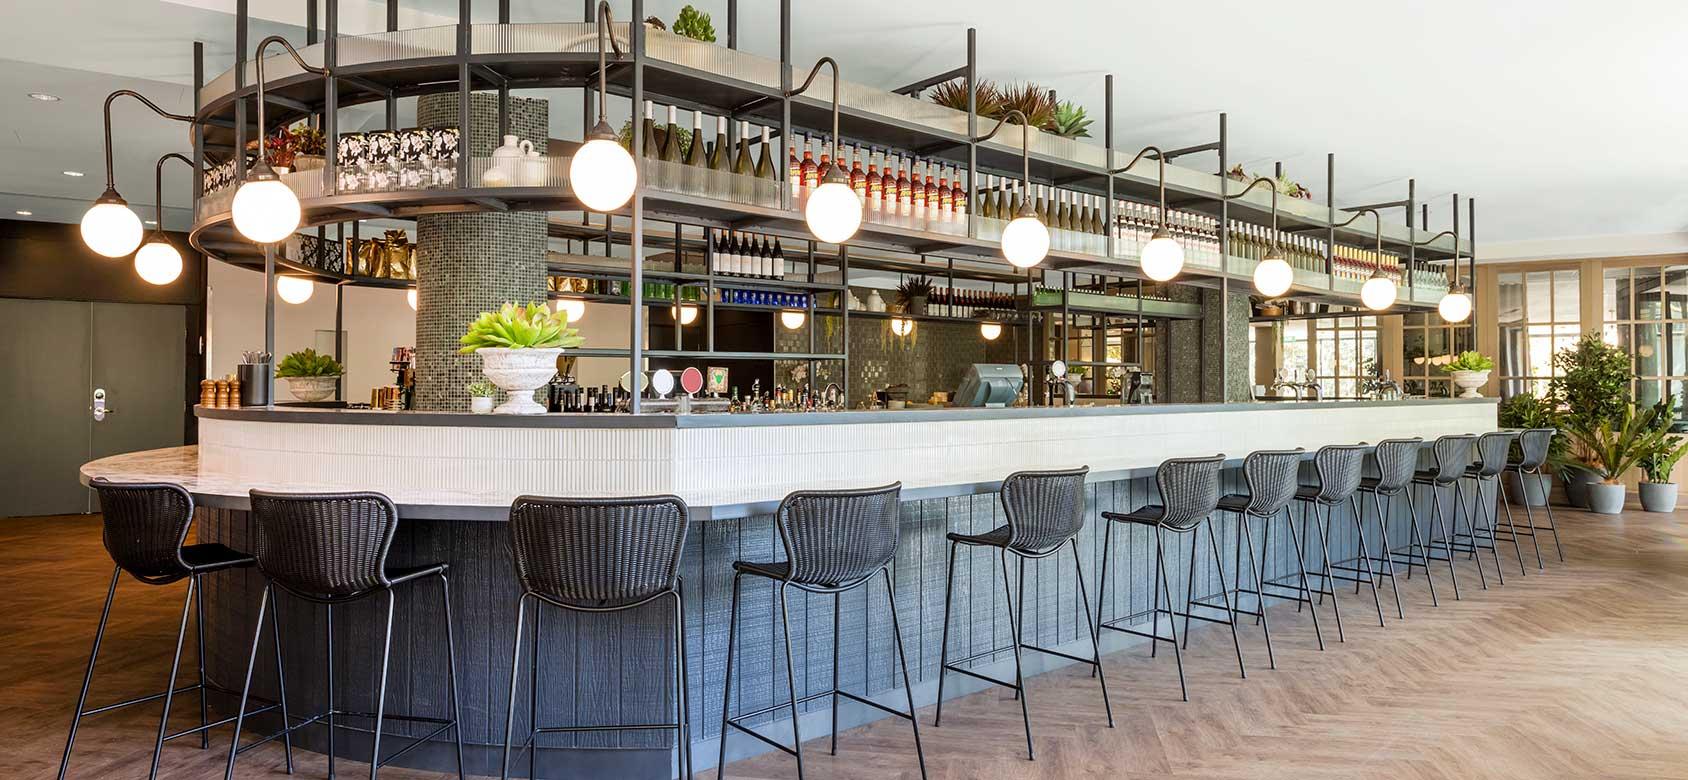 vibe-hotel-rushcutters-sydney-storehouse-on-the-park-bar-03-2016.jpg